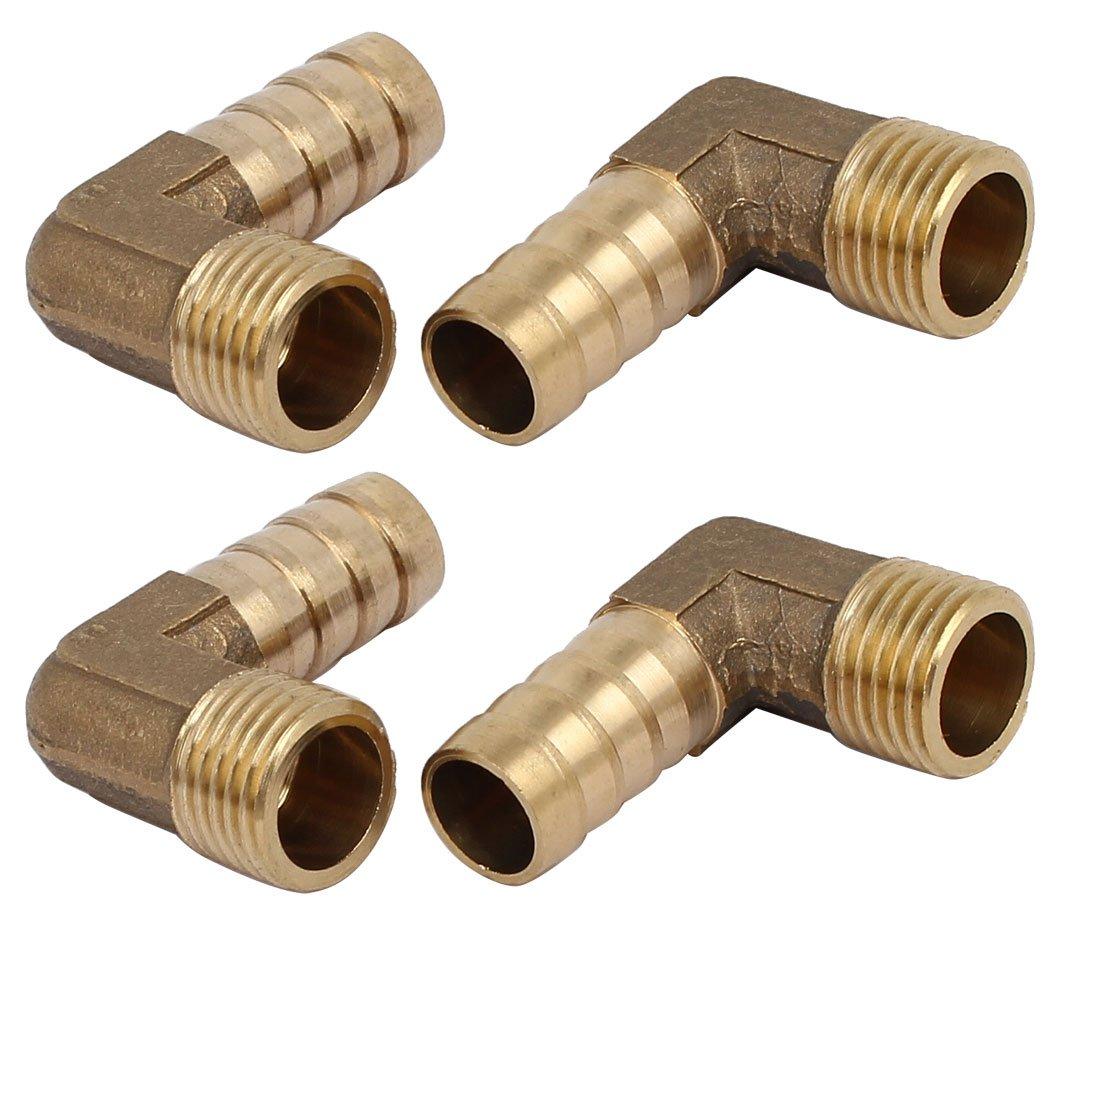 1//4BSP Thread 12mm Tube Dia 90 Degree Brass Hose Barb Coupler Connector 2pcs